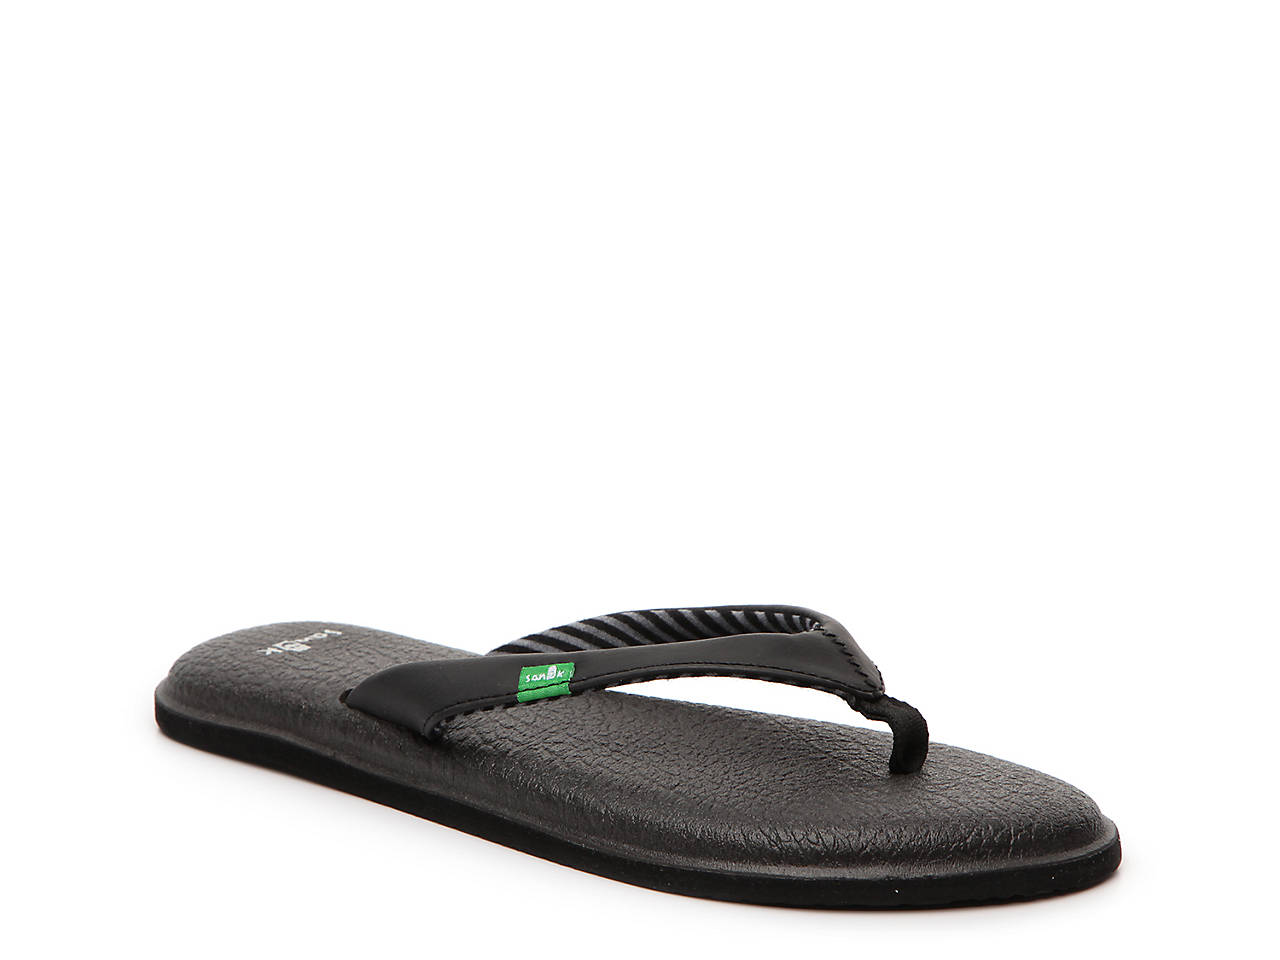 Sanuk Yoga Chakra Thong Sandals Womens Flip Flops Shoes Flat Heel